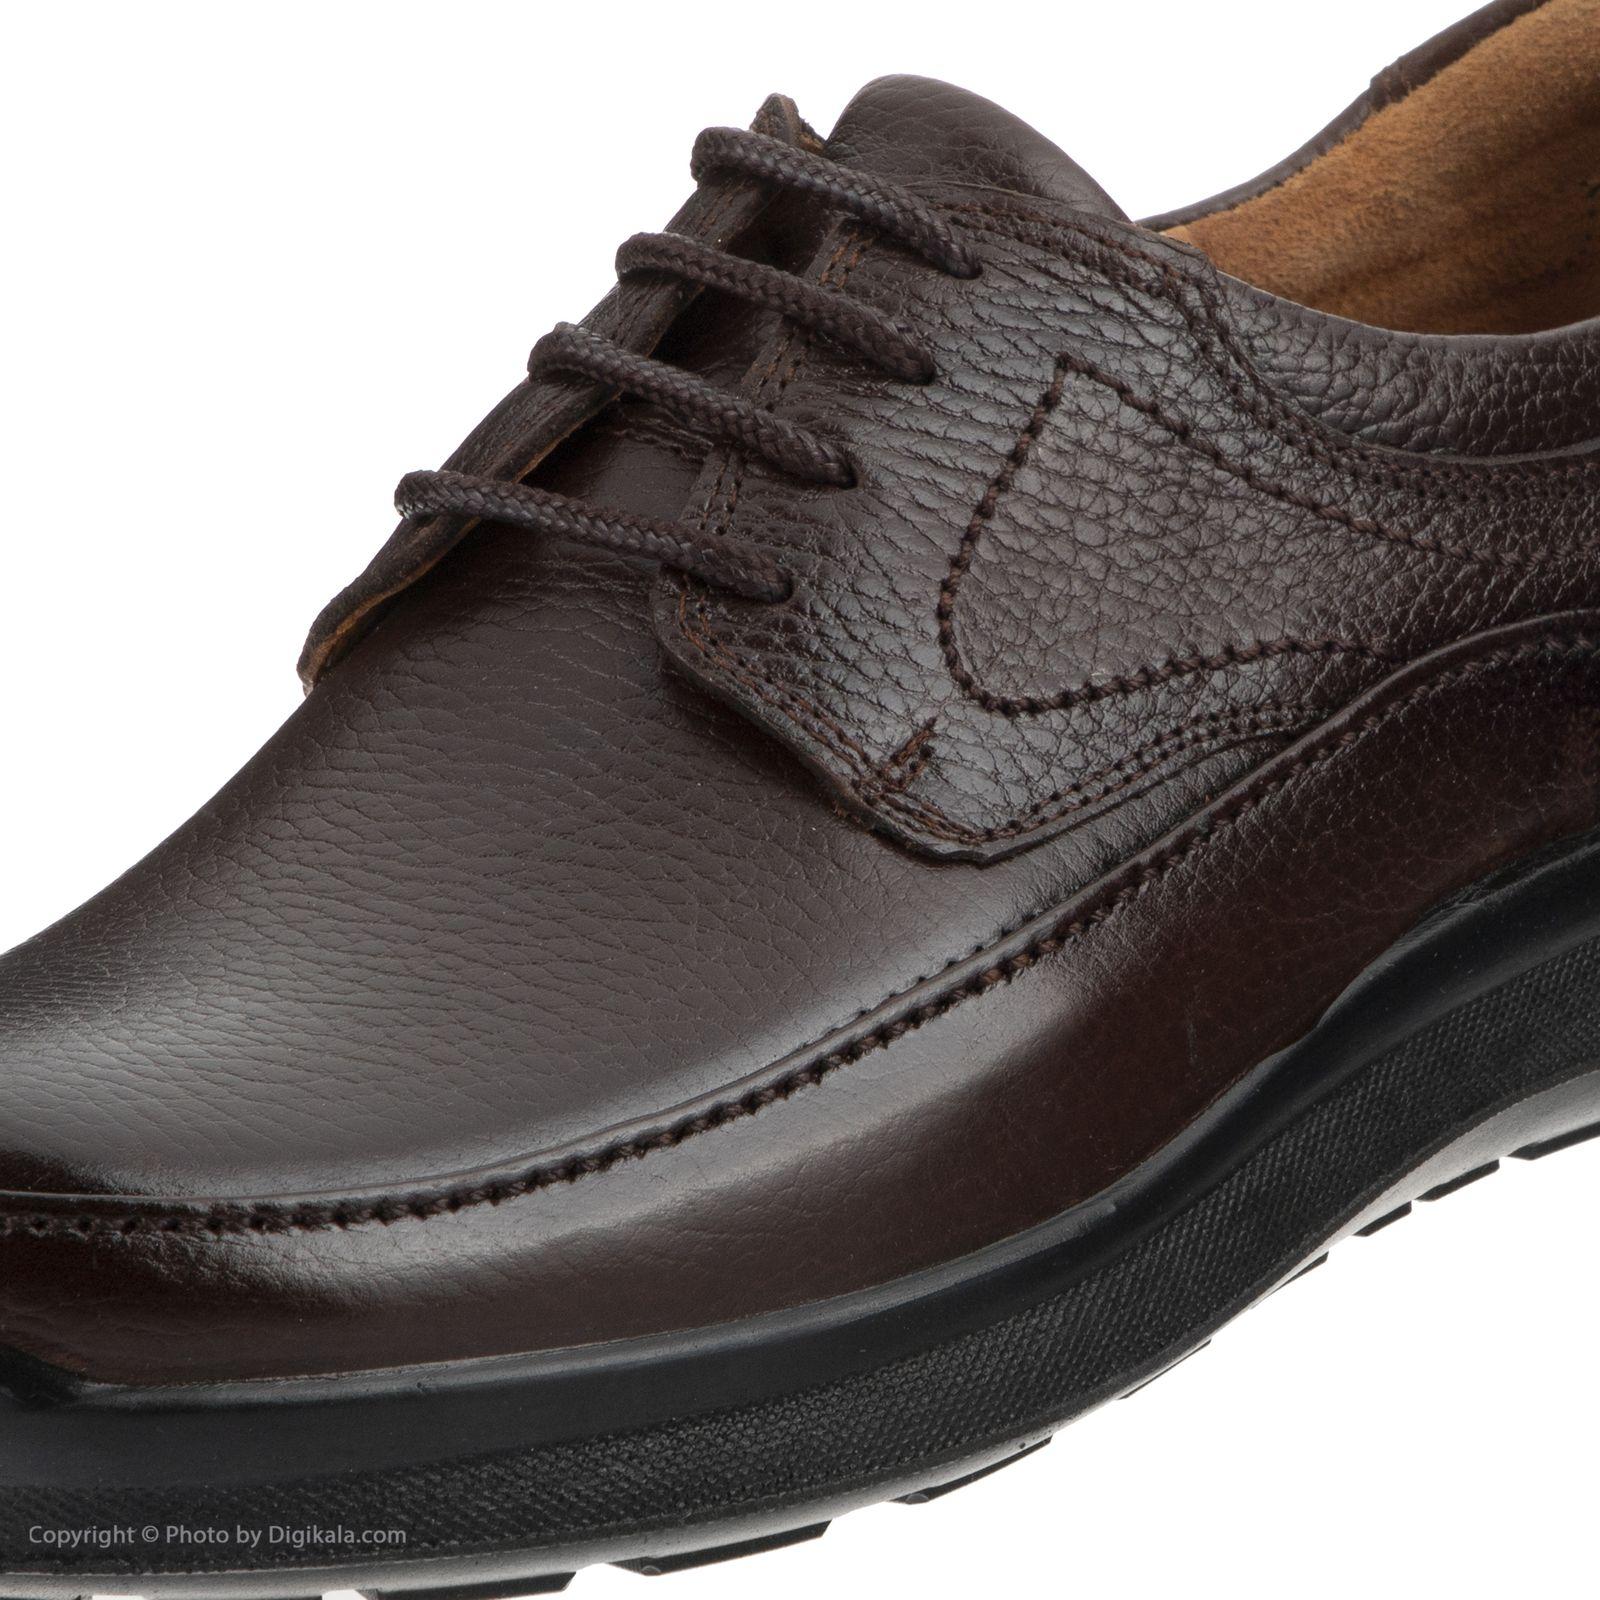 کفش روزمره مردانه بلوط مدل 7266C503104 -  - 7